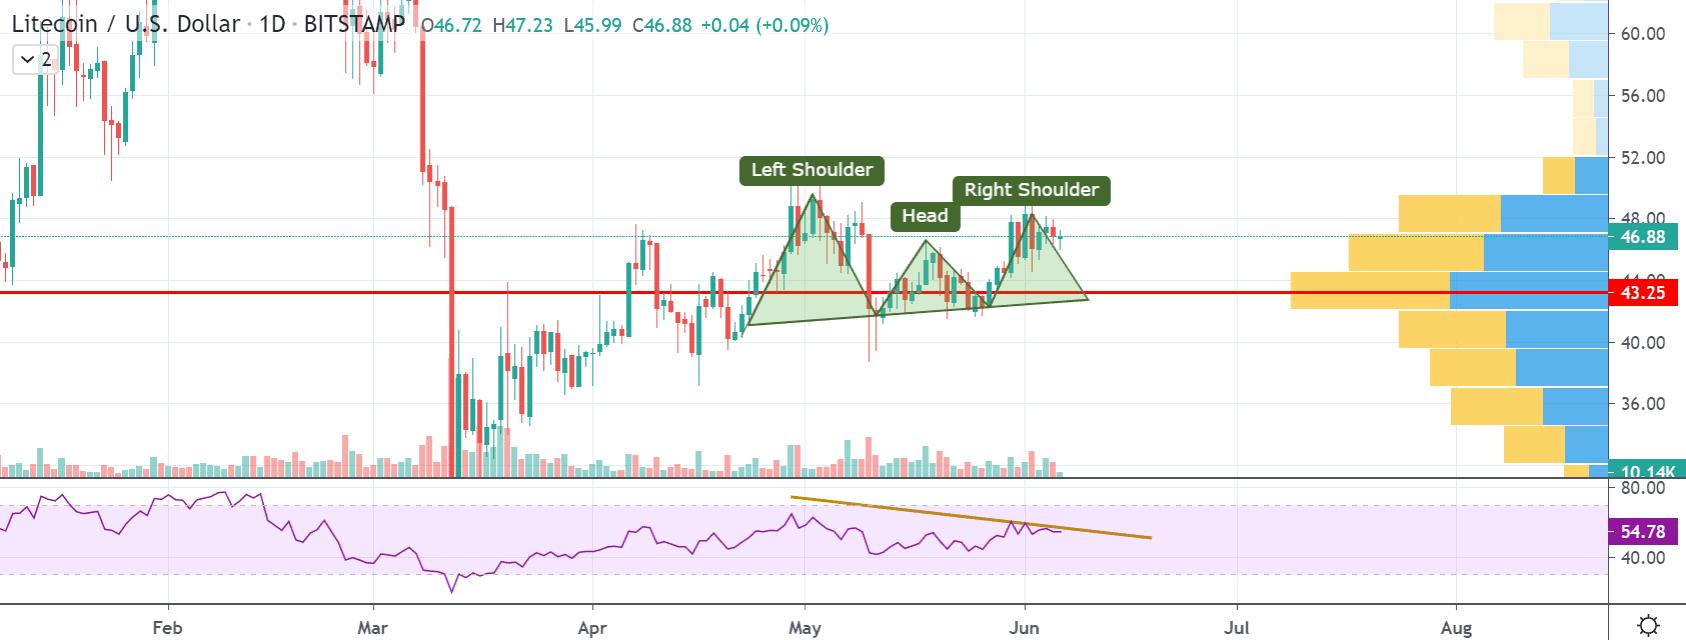 Litecoin Price Featured Chart